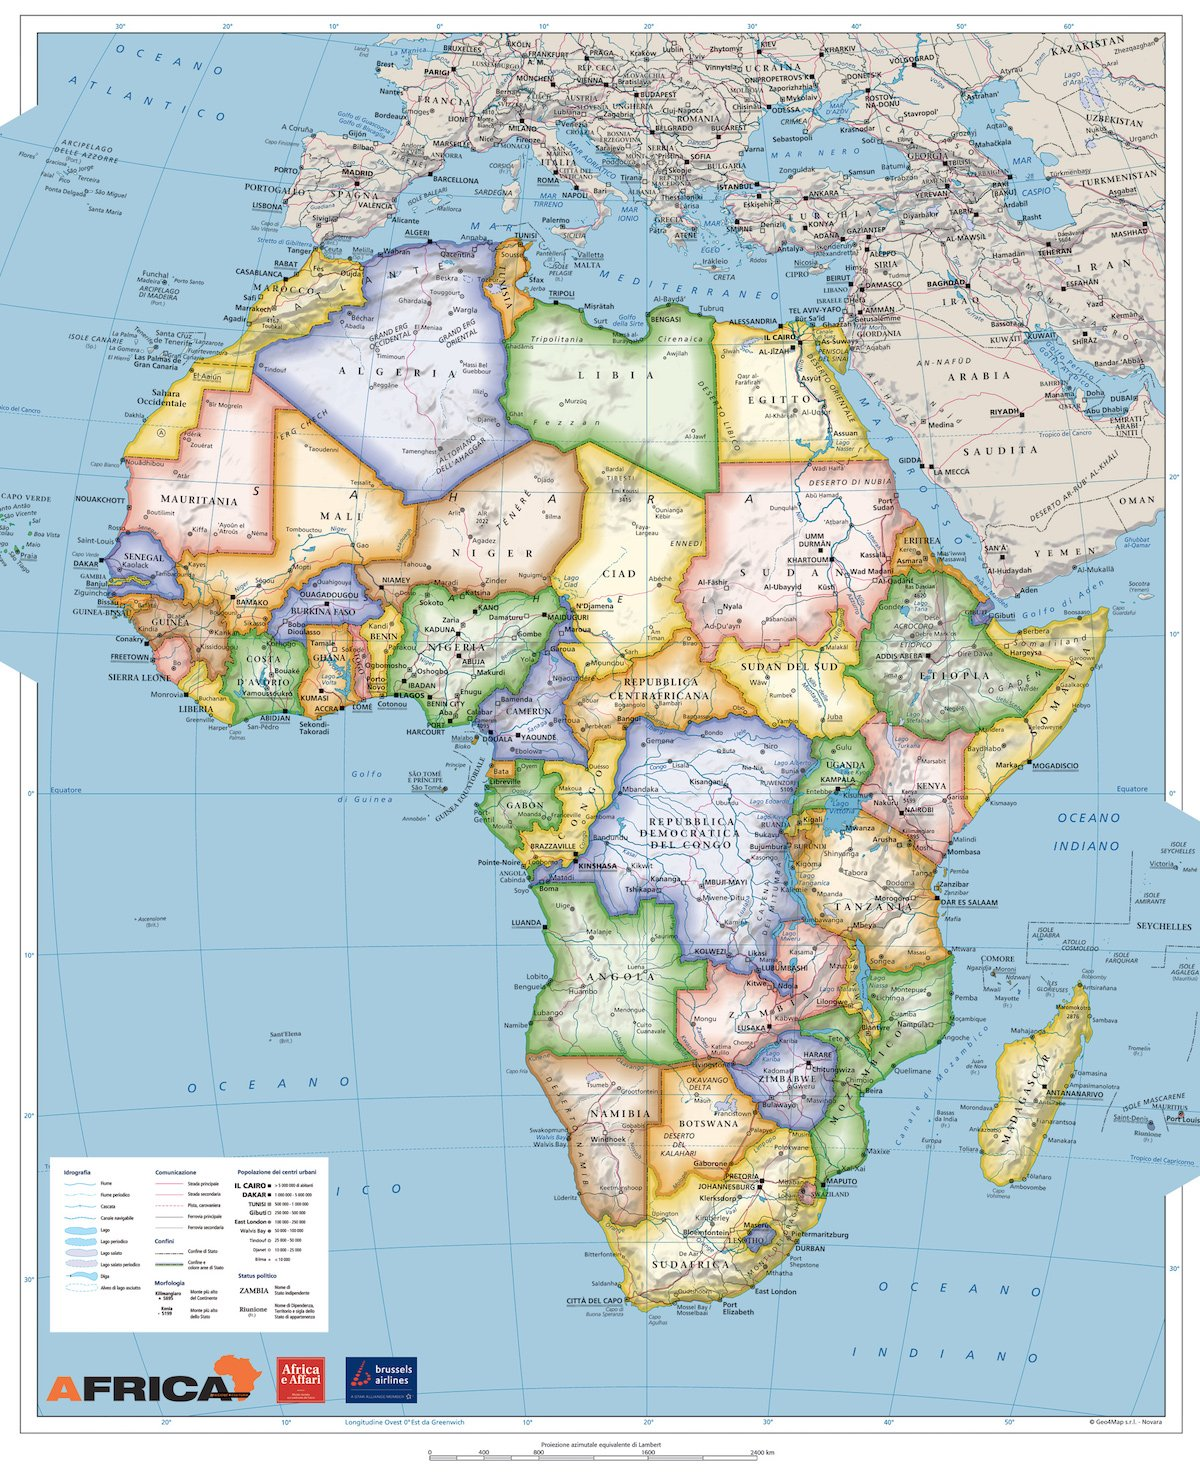 Africa Cartina Geografica Politica.Mappa Politica E Fisica Dell Africa Africa